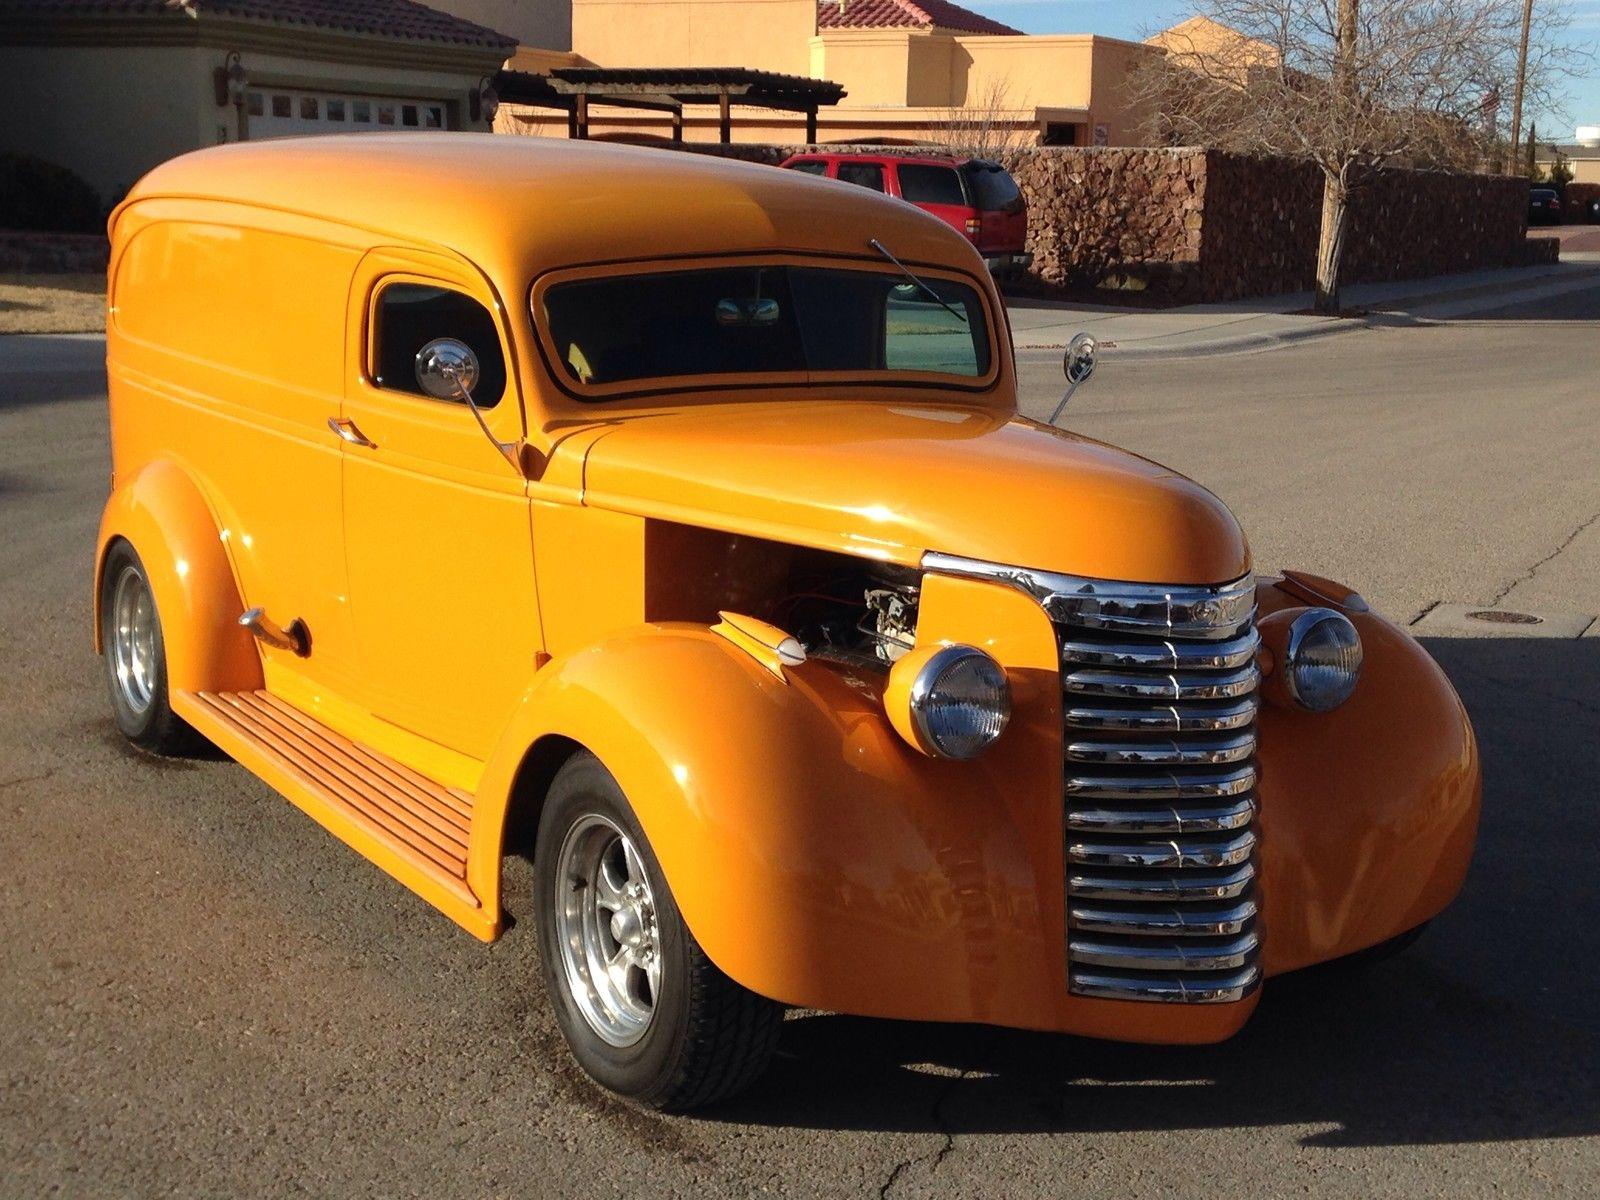 Hot Rod Chopped Panel Rat Shop Truck Classic Gmc Other 1949 Dodge Van